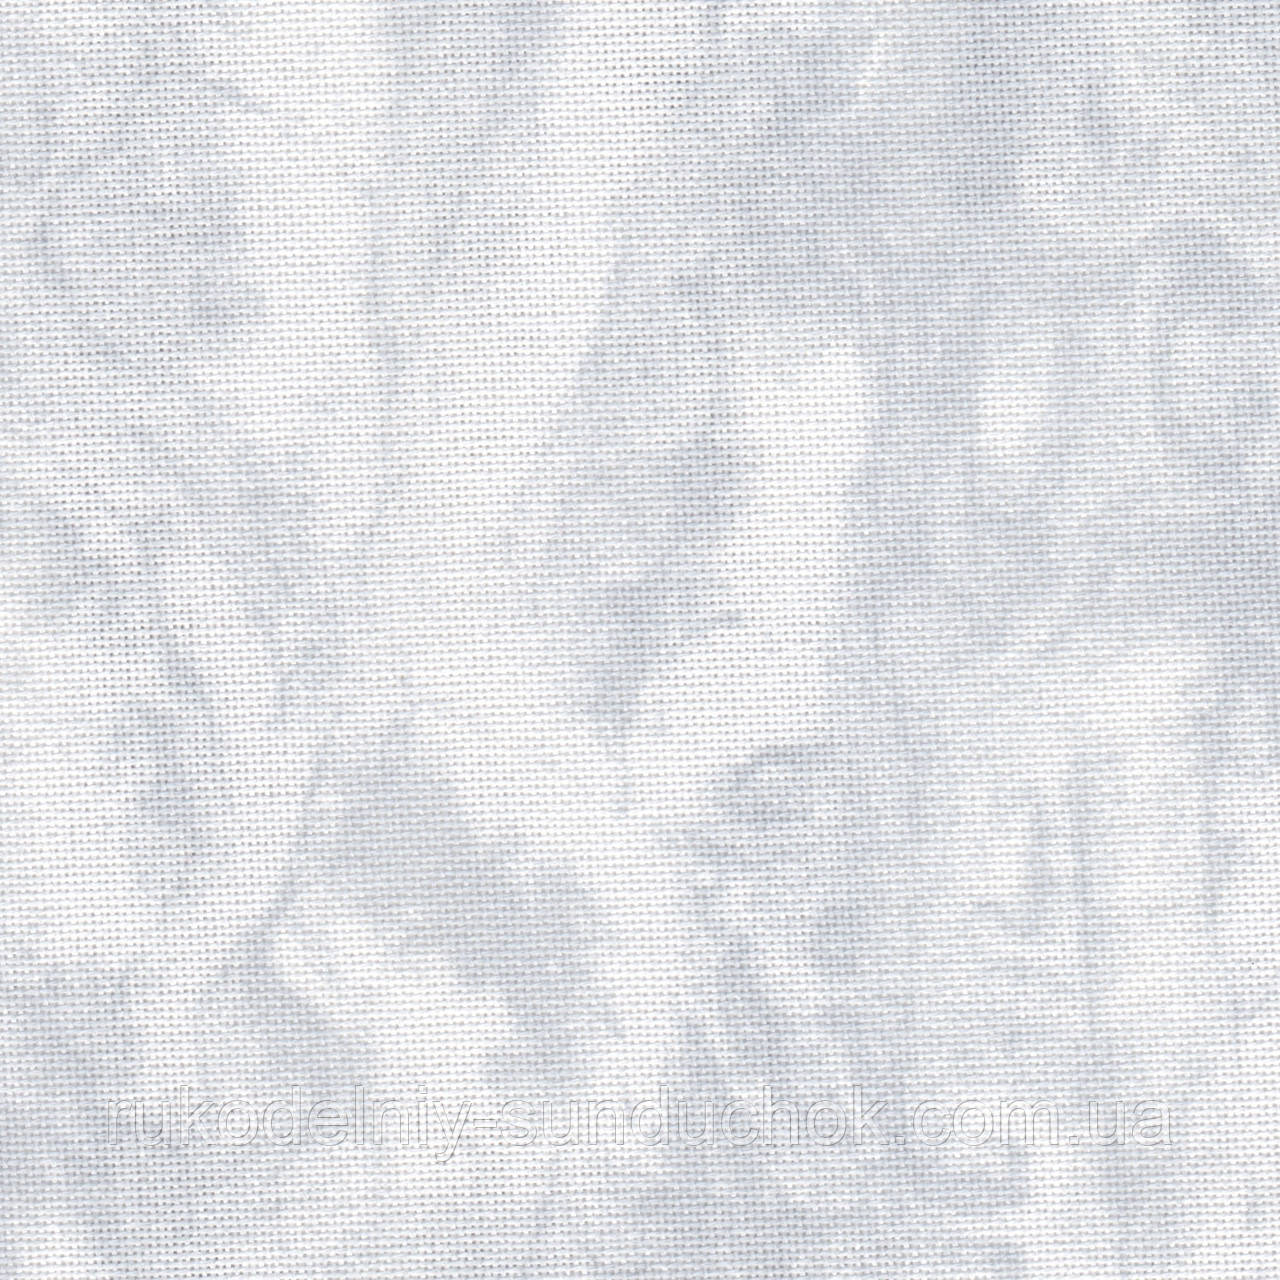 Ткань равномерного переплетения Zweigart Murano Lugana 32 ct. 3984/7139 Marble / Stormy Clouds (мраморный)